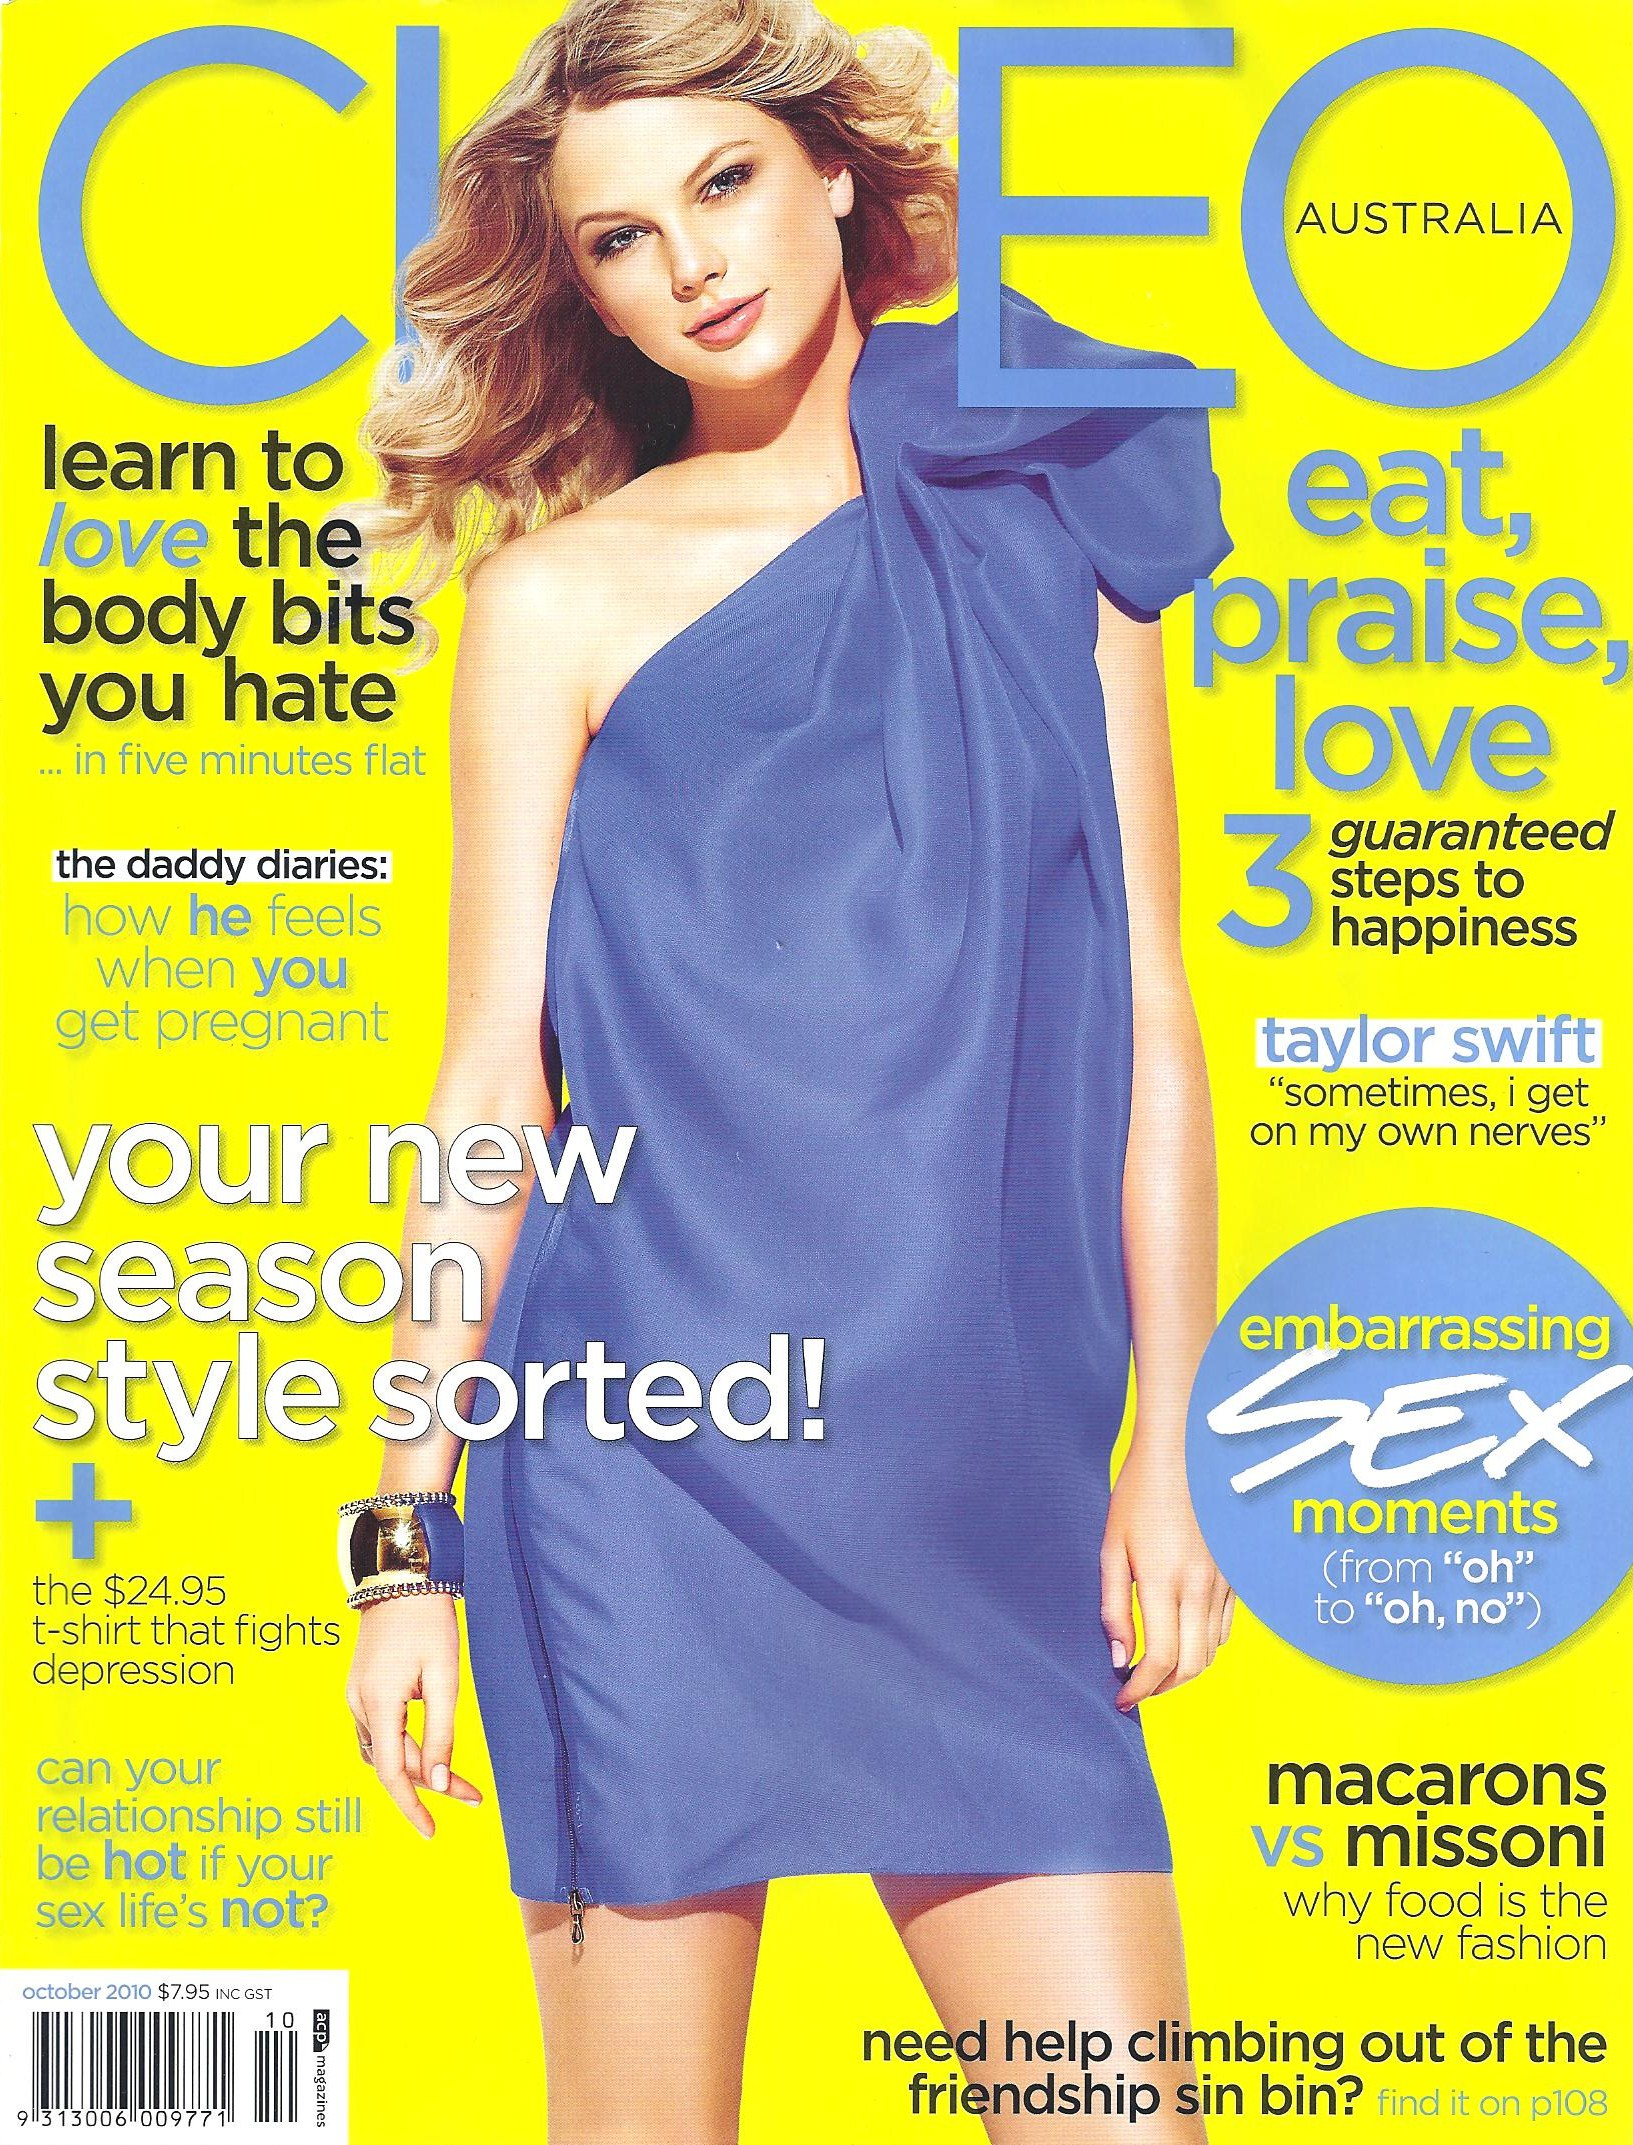 CLEO Magazine, October 2010